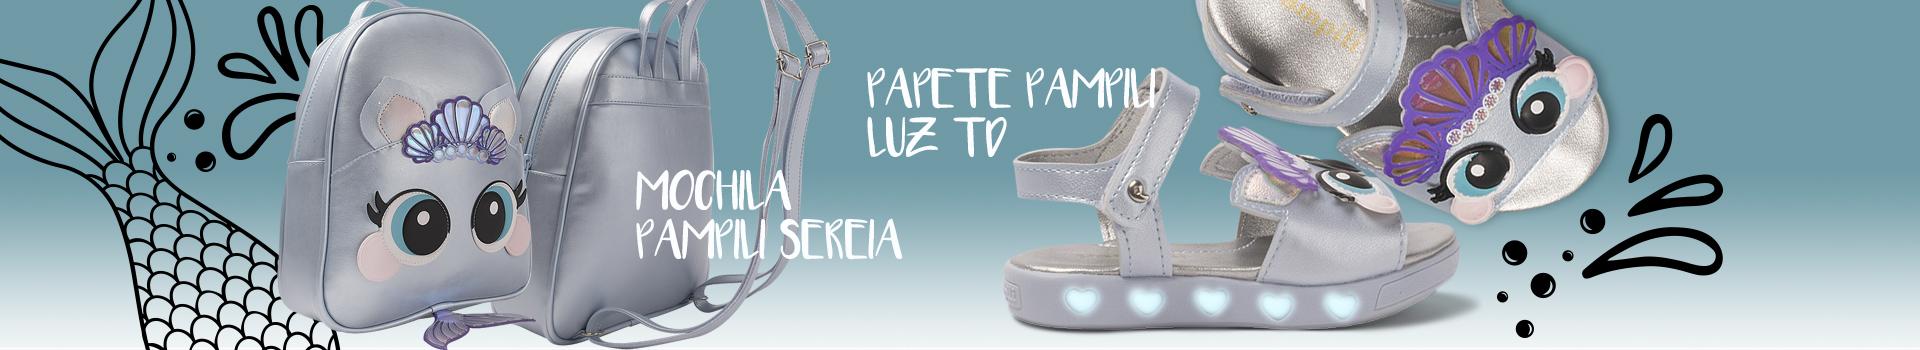 tvdesk p3-04 02 19-Pampili Sereia 4c5c85ce7a1